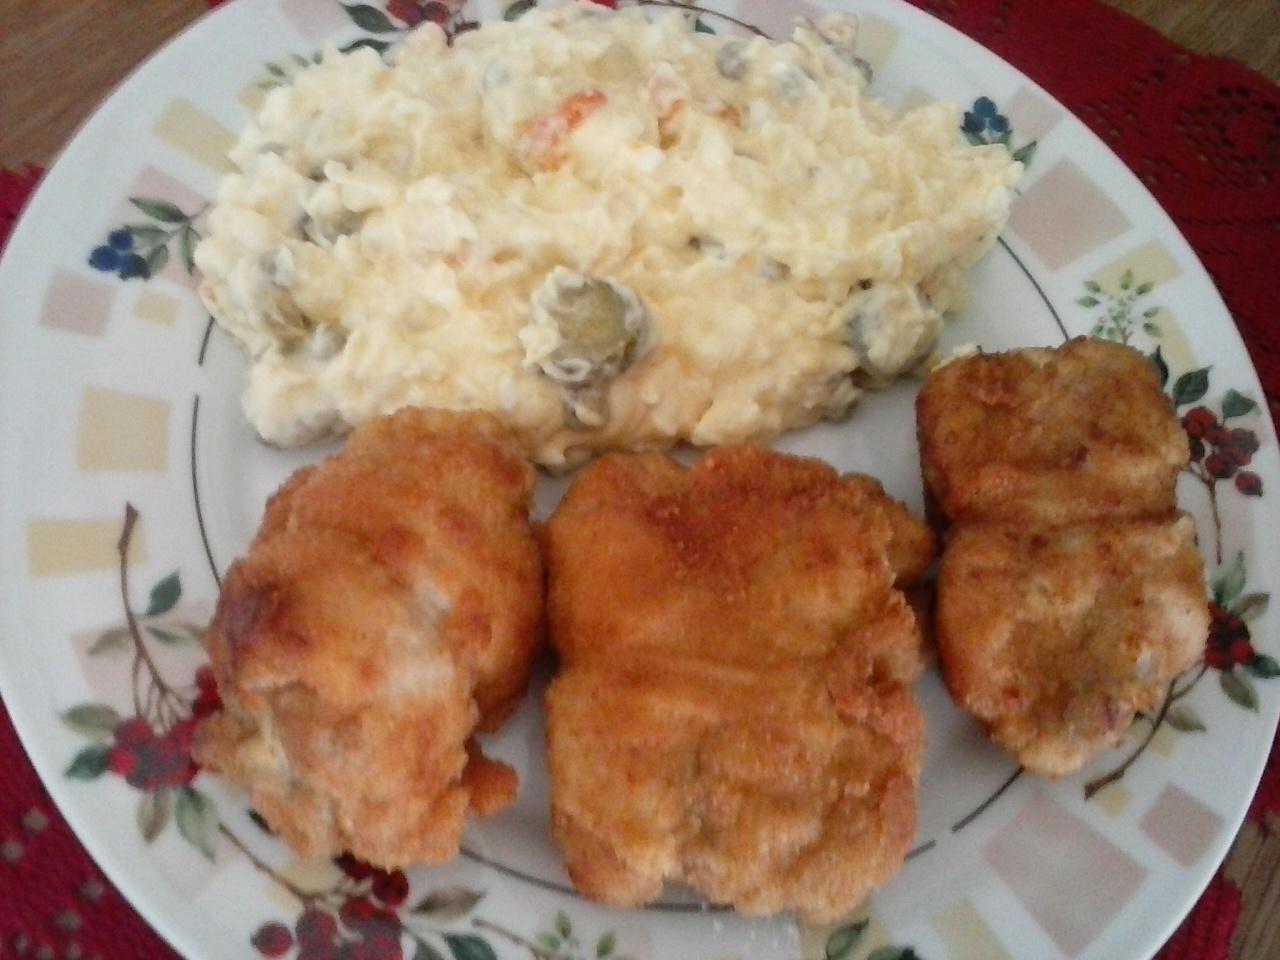 Recept Kuřecí závitek se špekem a šalvějí - Kuřecí závitek se špekem a šalvějí